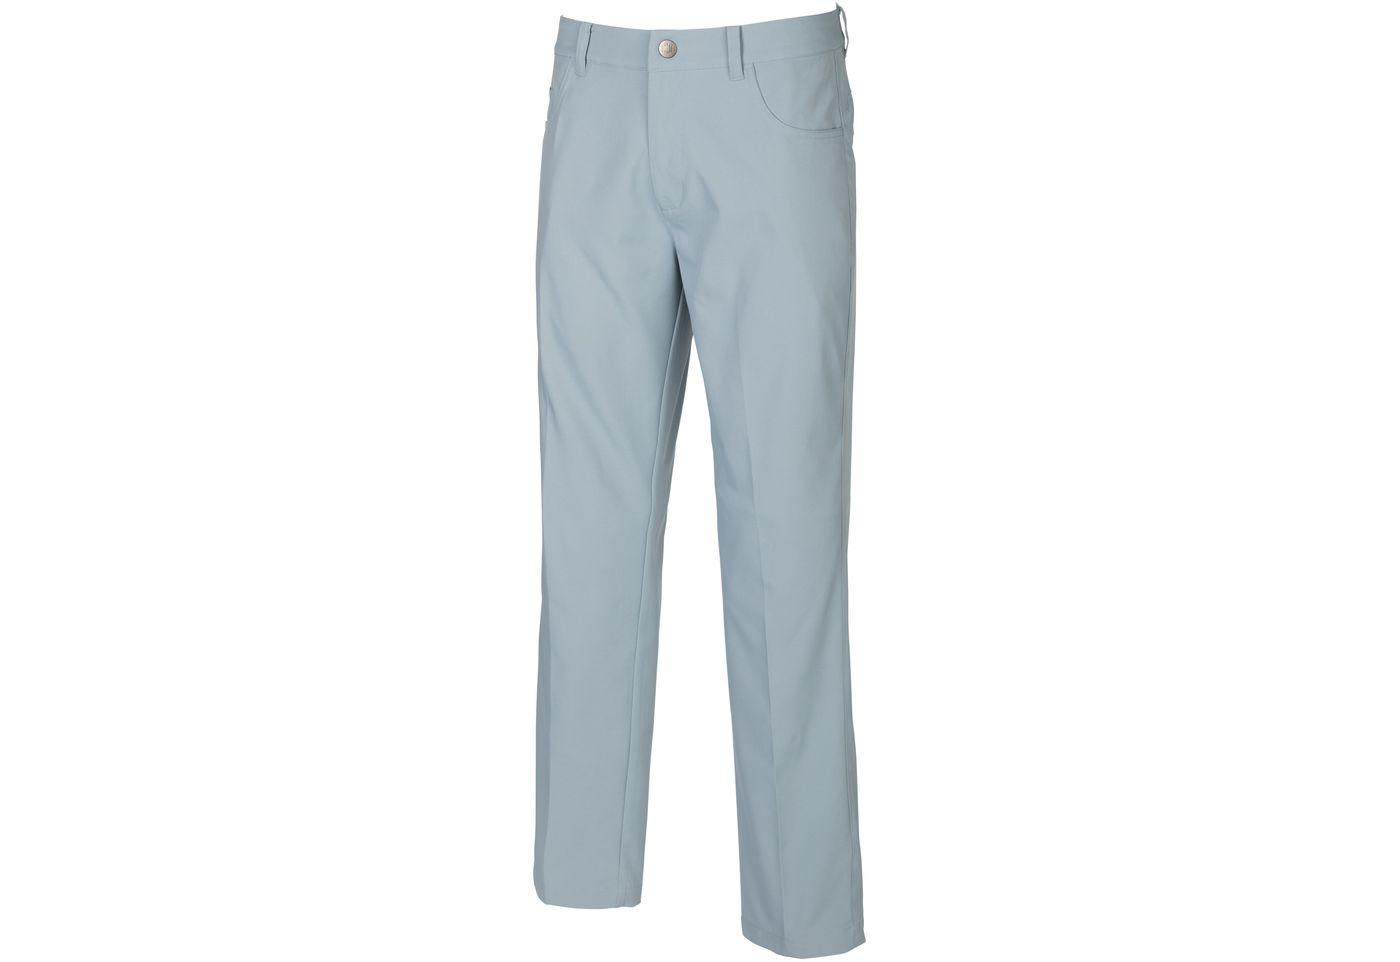 PUMA Men's Jackpot 5 Pocket Golf Pants